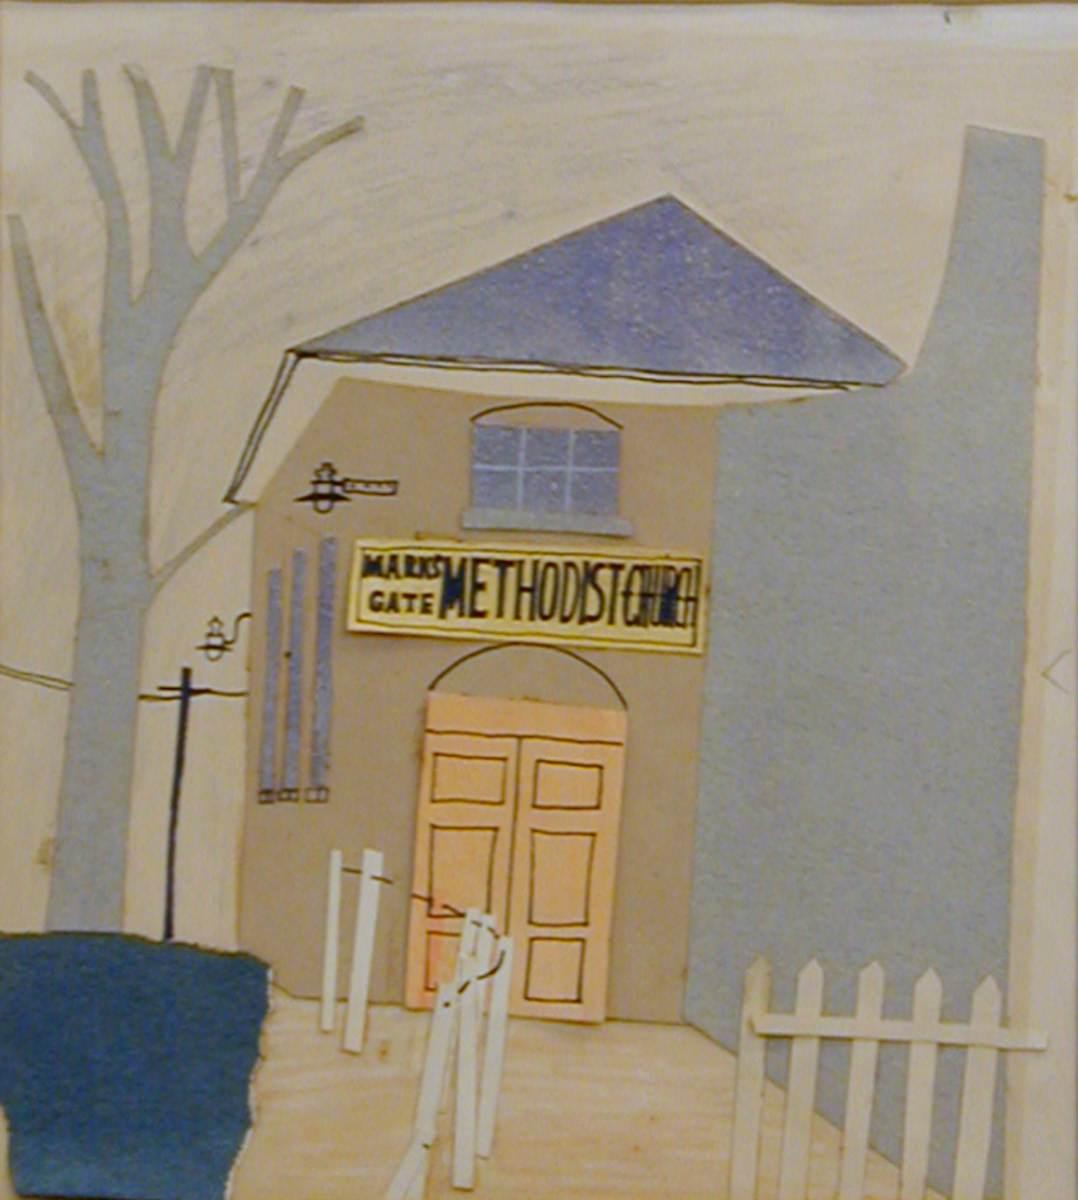 Marks Gate Methodist Church